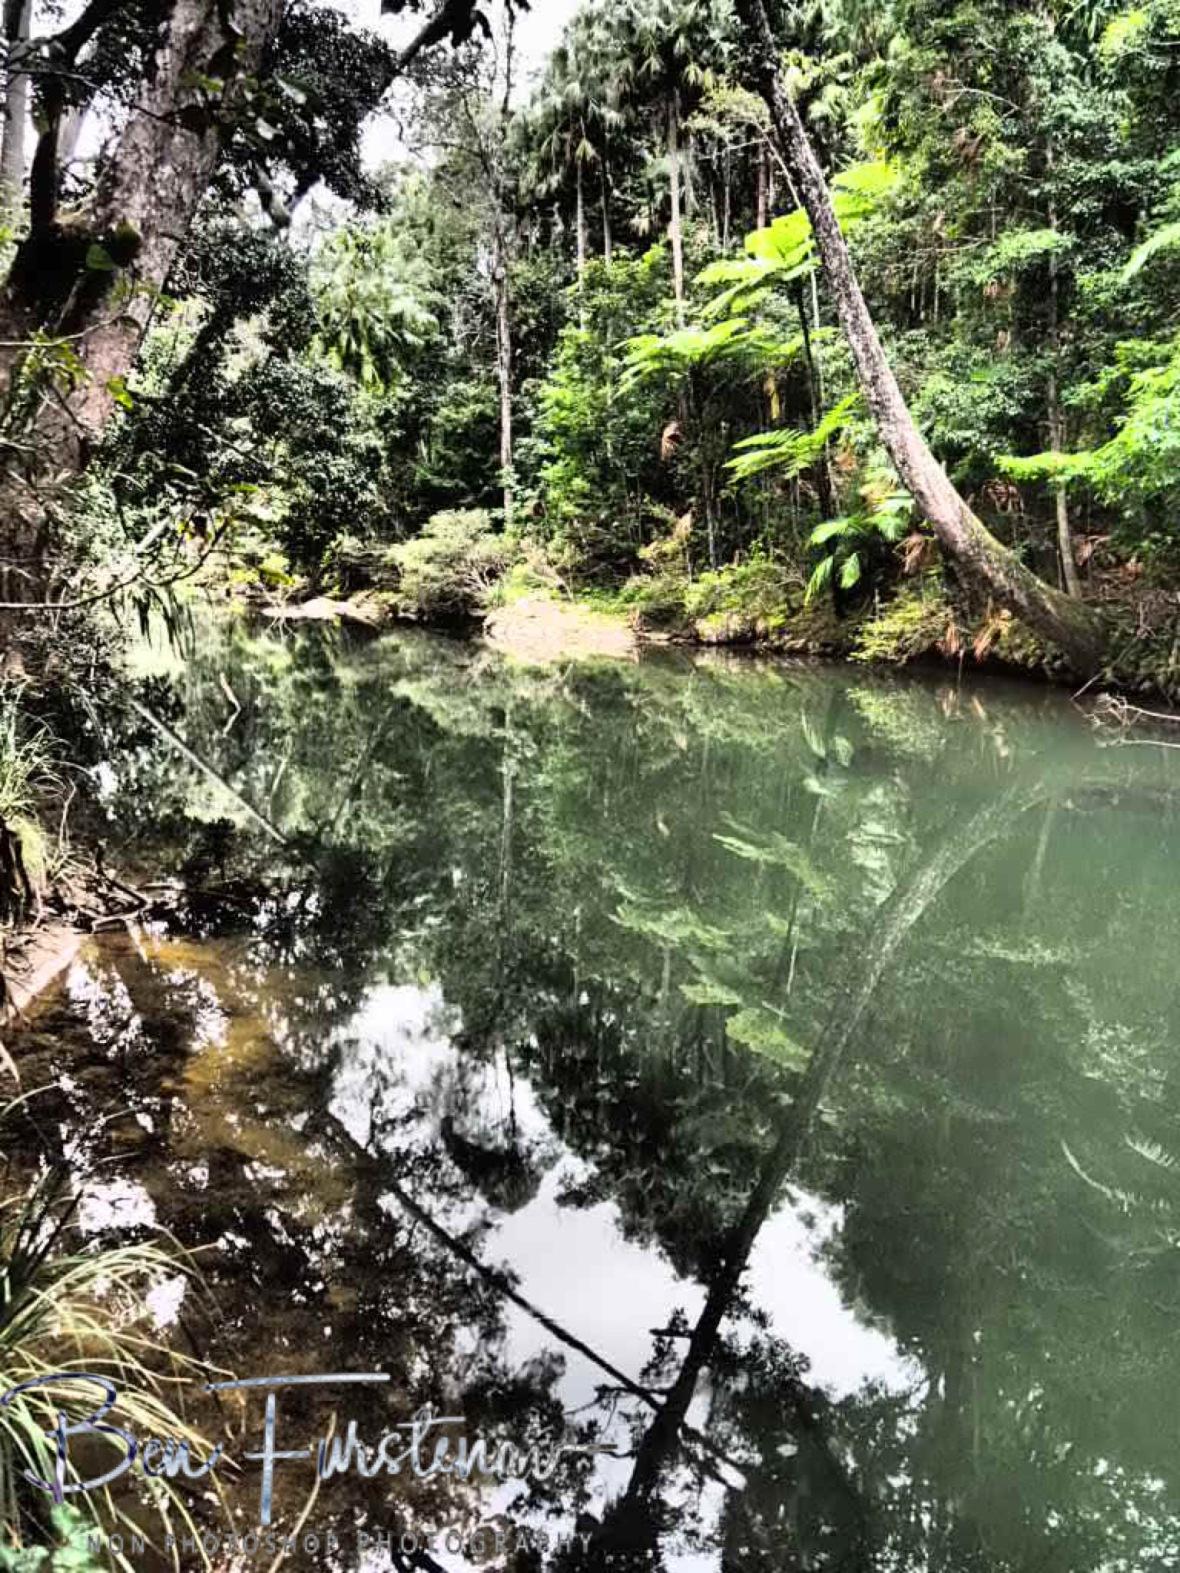 A calm and picturesque habitat for centuries at Eungalla National Park, Queensland, Australia